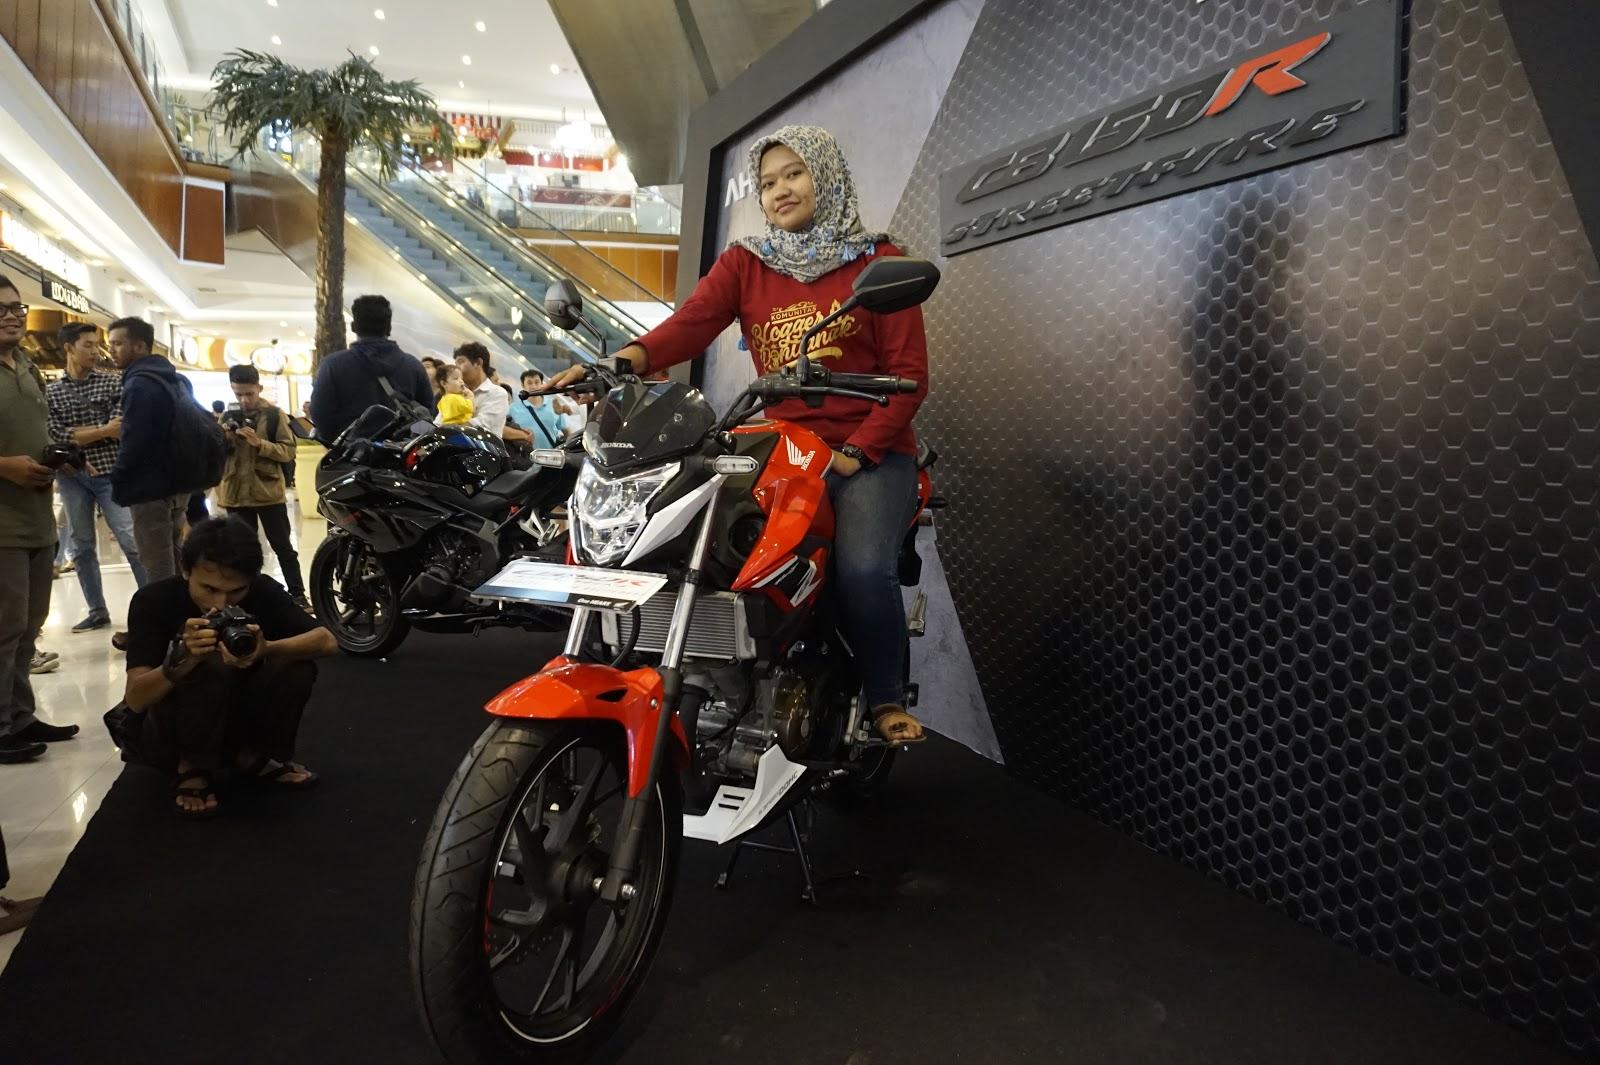 Dare Pontianak All New Cb 150r Streetfire Raptor Black Jakarta Semakin Keren Dengan Honda Cb150r Street Fire